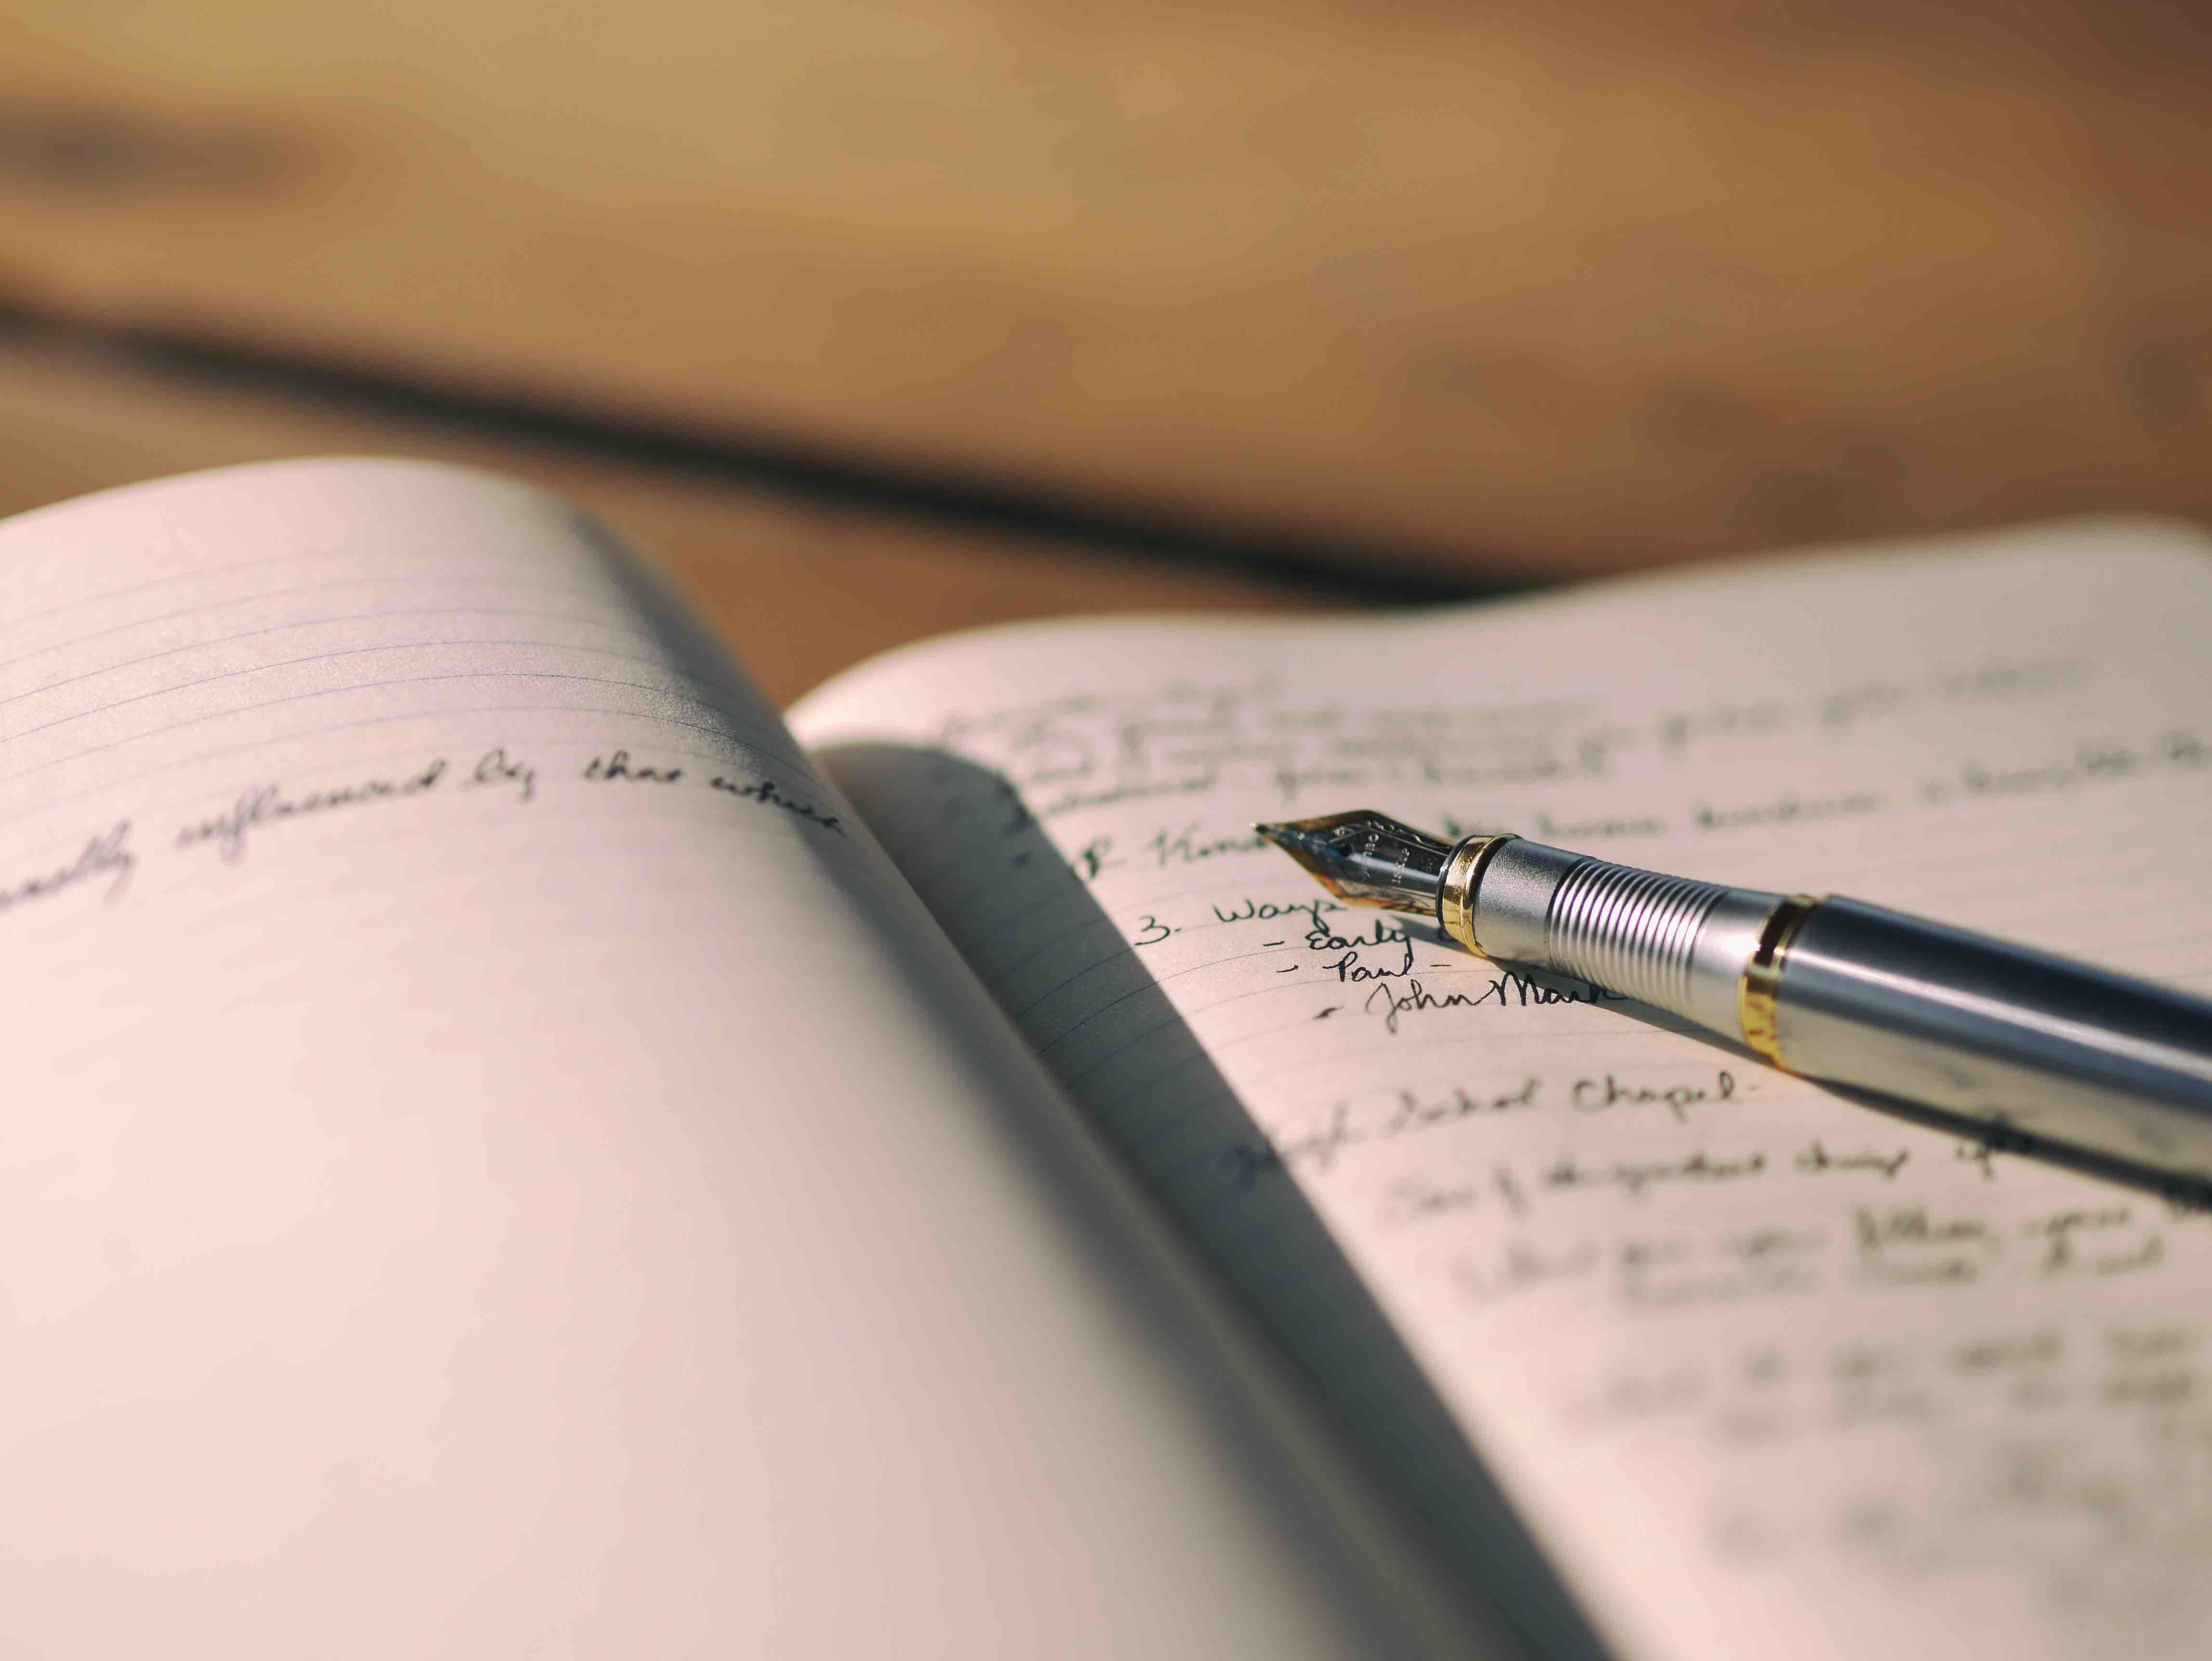 Bettina-deda-copywriter-SEO-web-copy-freelancer-content-marketing